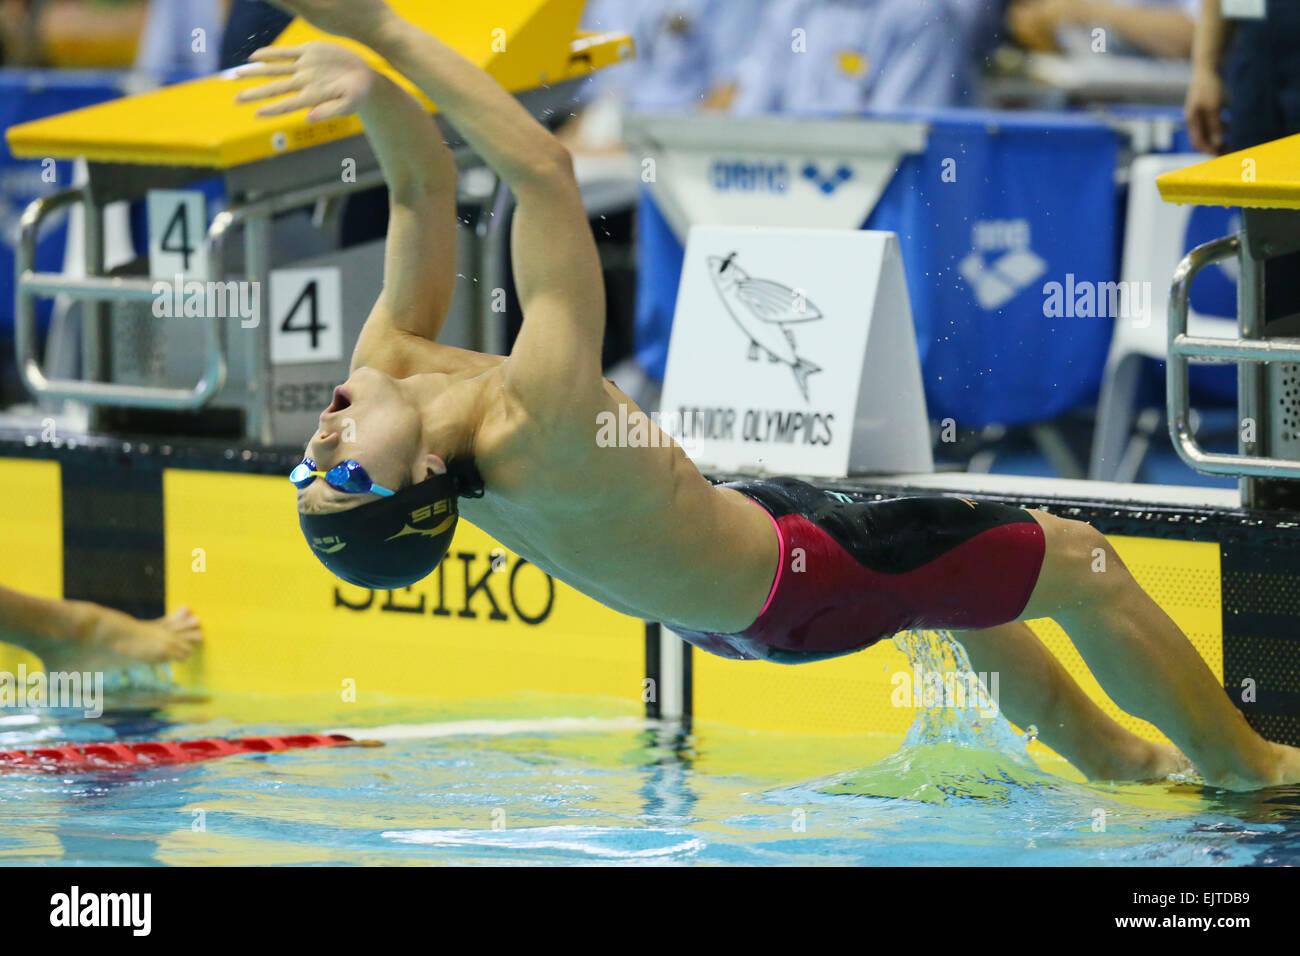 tatsumi international swimming pool tokyo japan 30th mar 2015 shota okajima march 30 2015 swimming the 37th joc junior olympic cup mens 100m